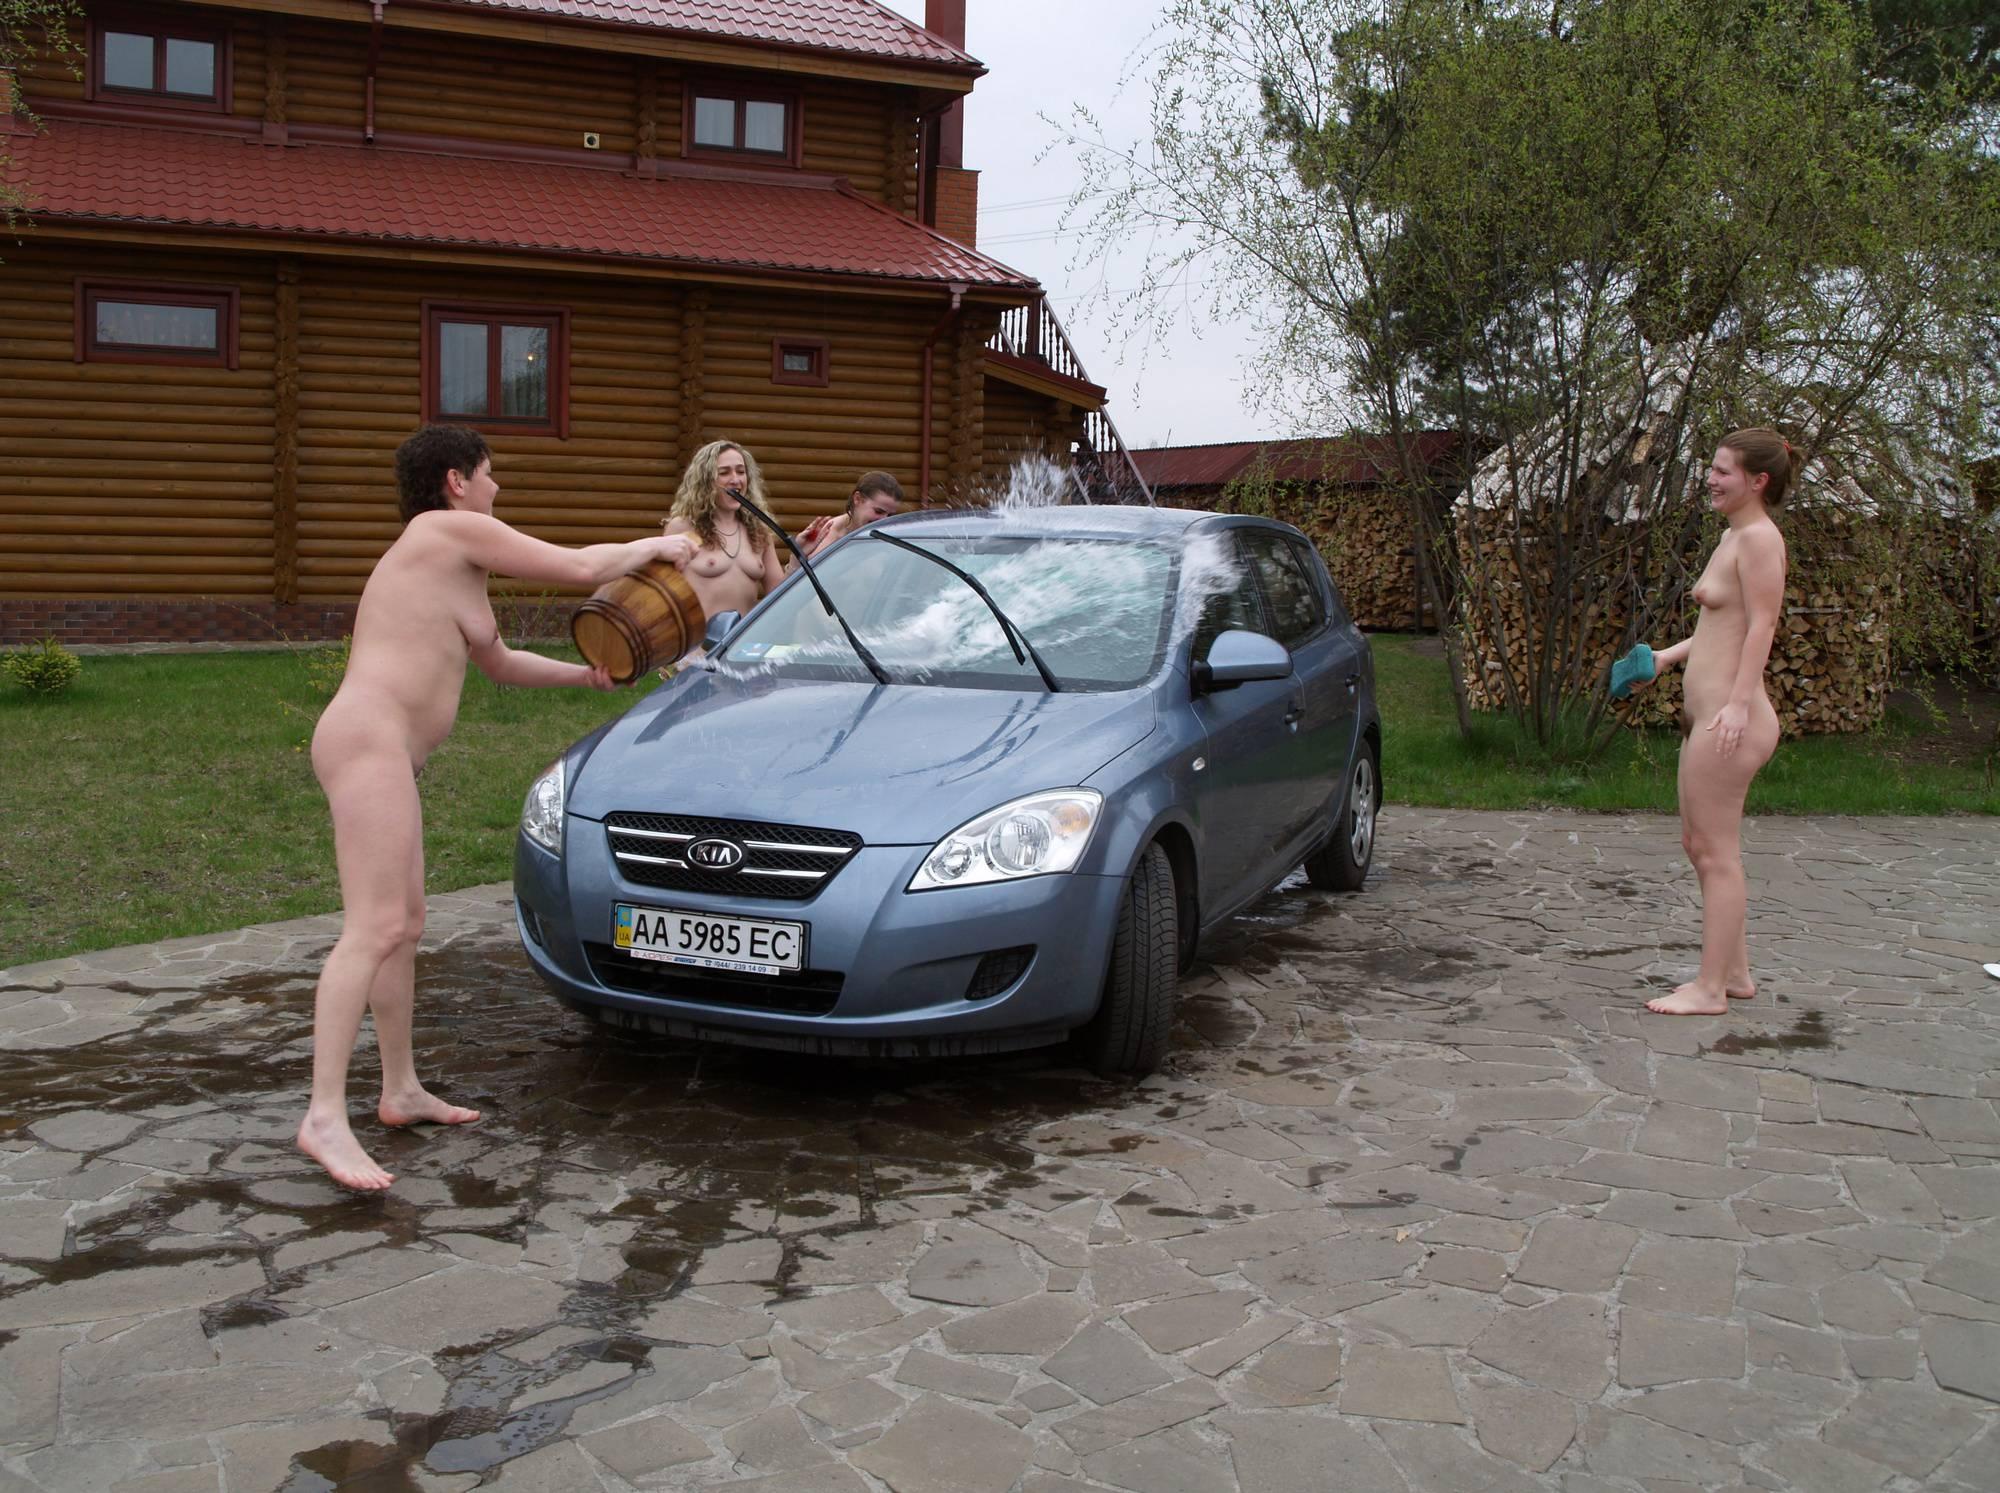 Washing Car In The Nude - 1